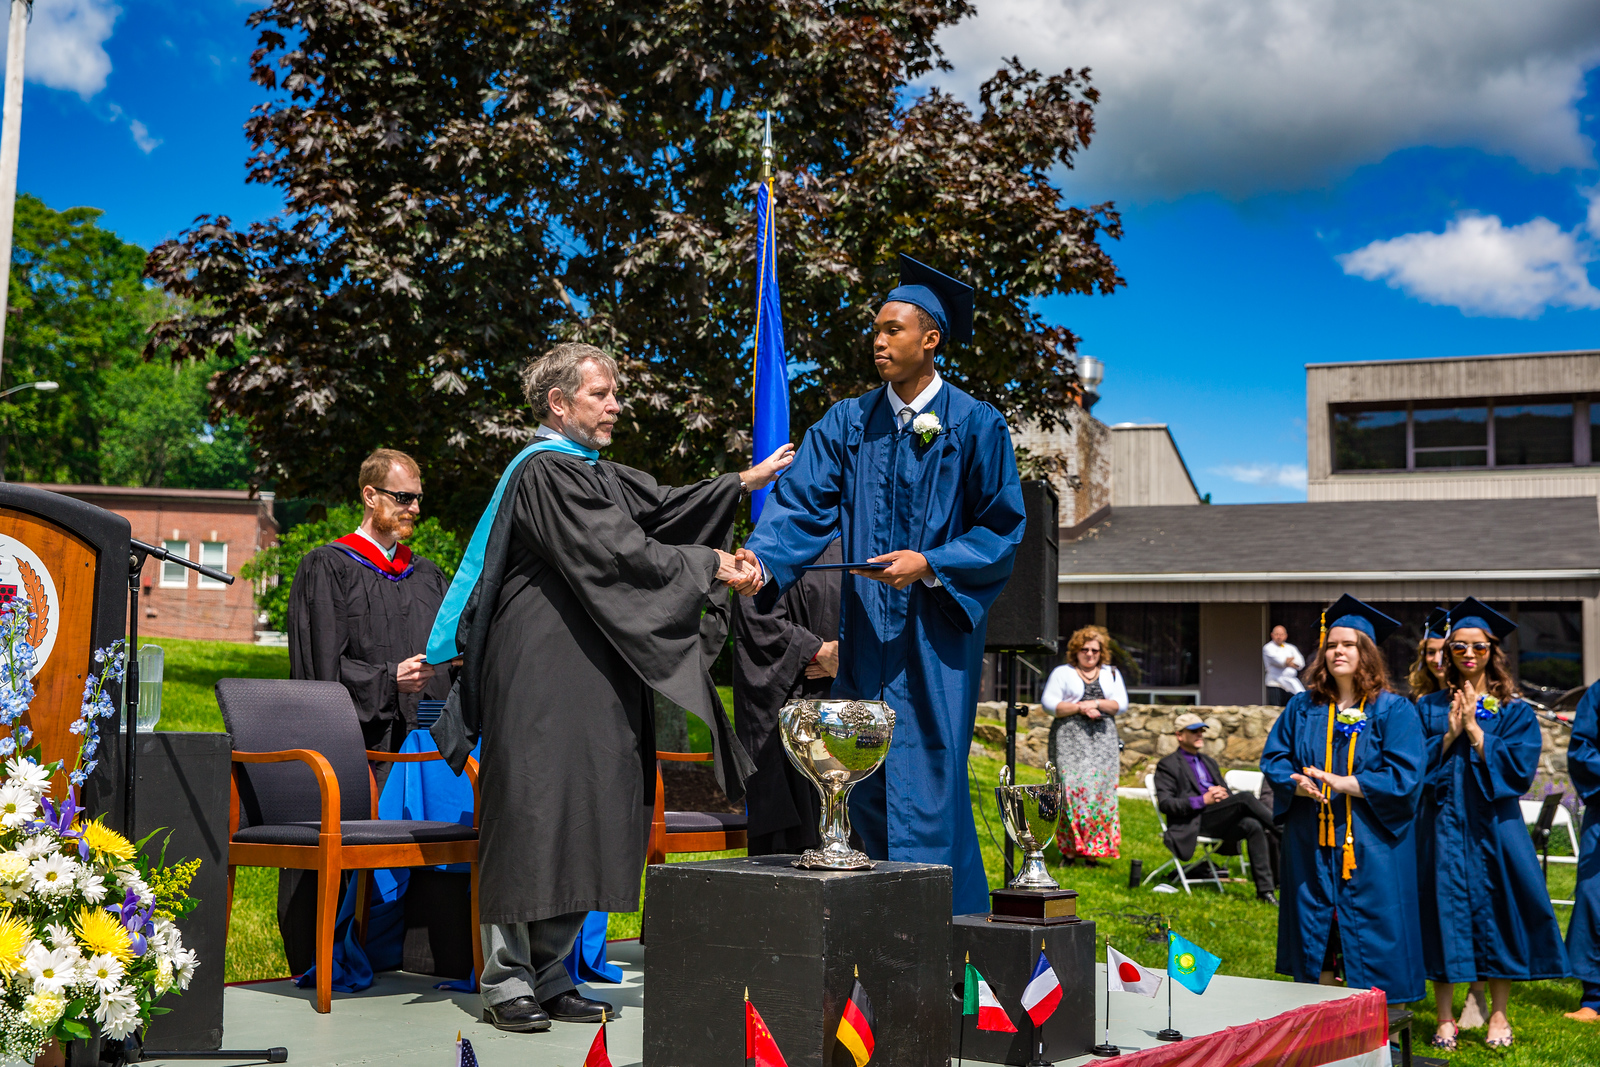 Headmaster Lamb congratulates Elijah Barnett on receiving his diploma